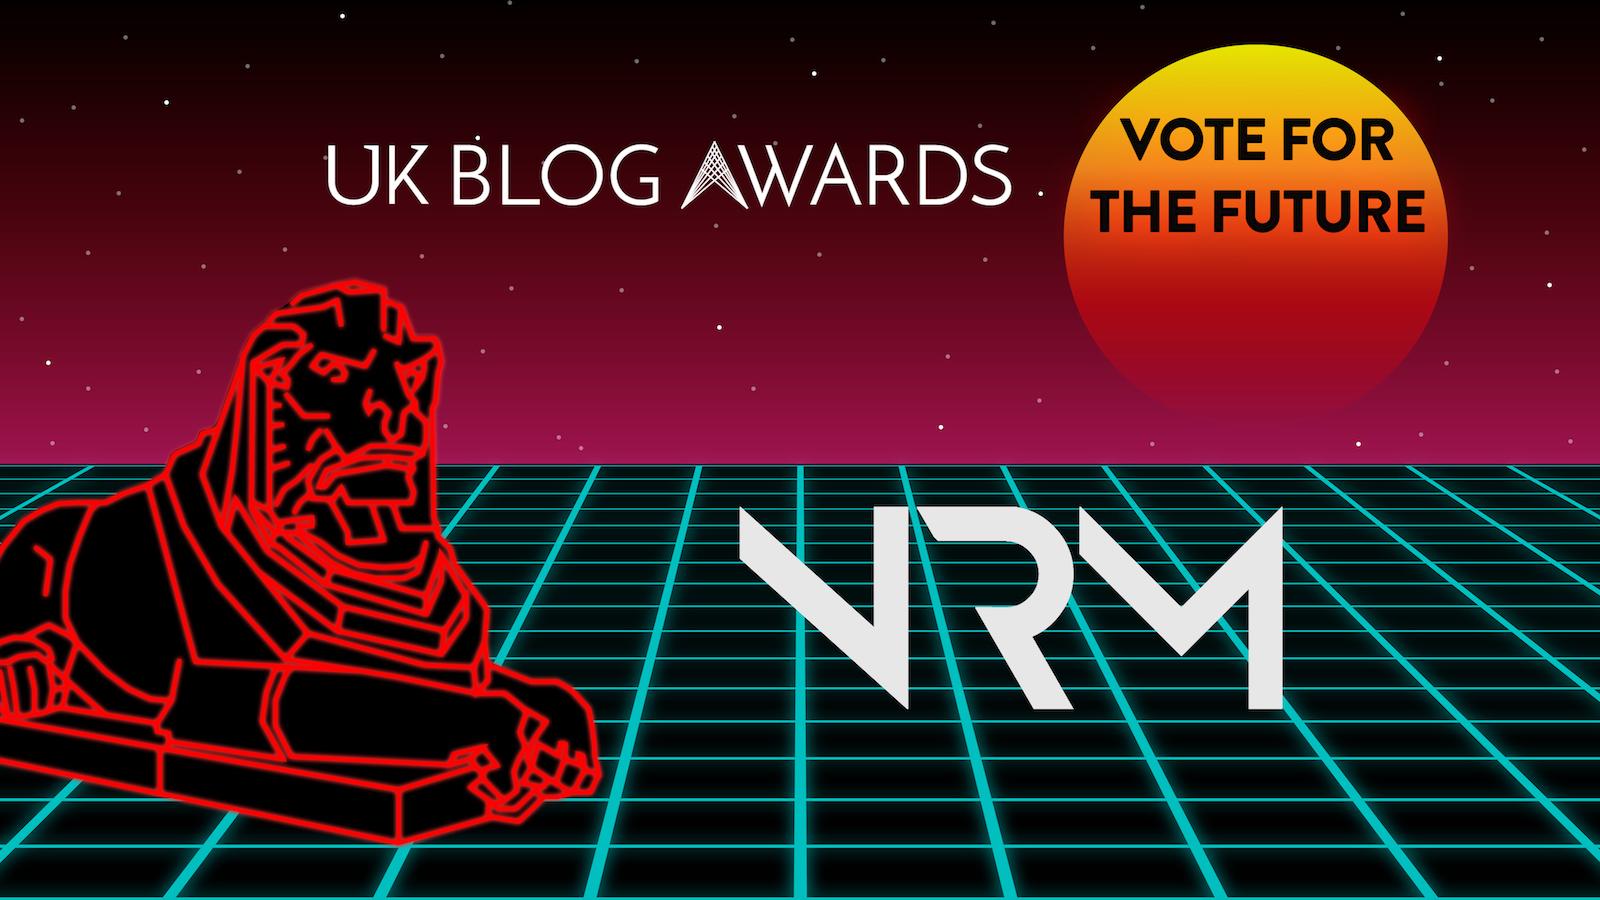 new rising media uk blog awards 2019.jpg